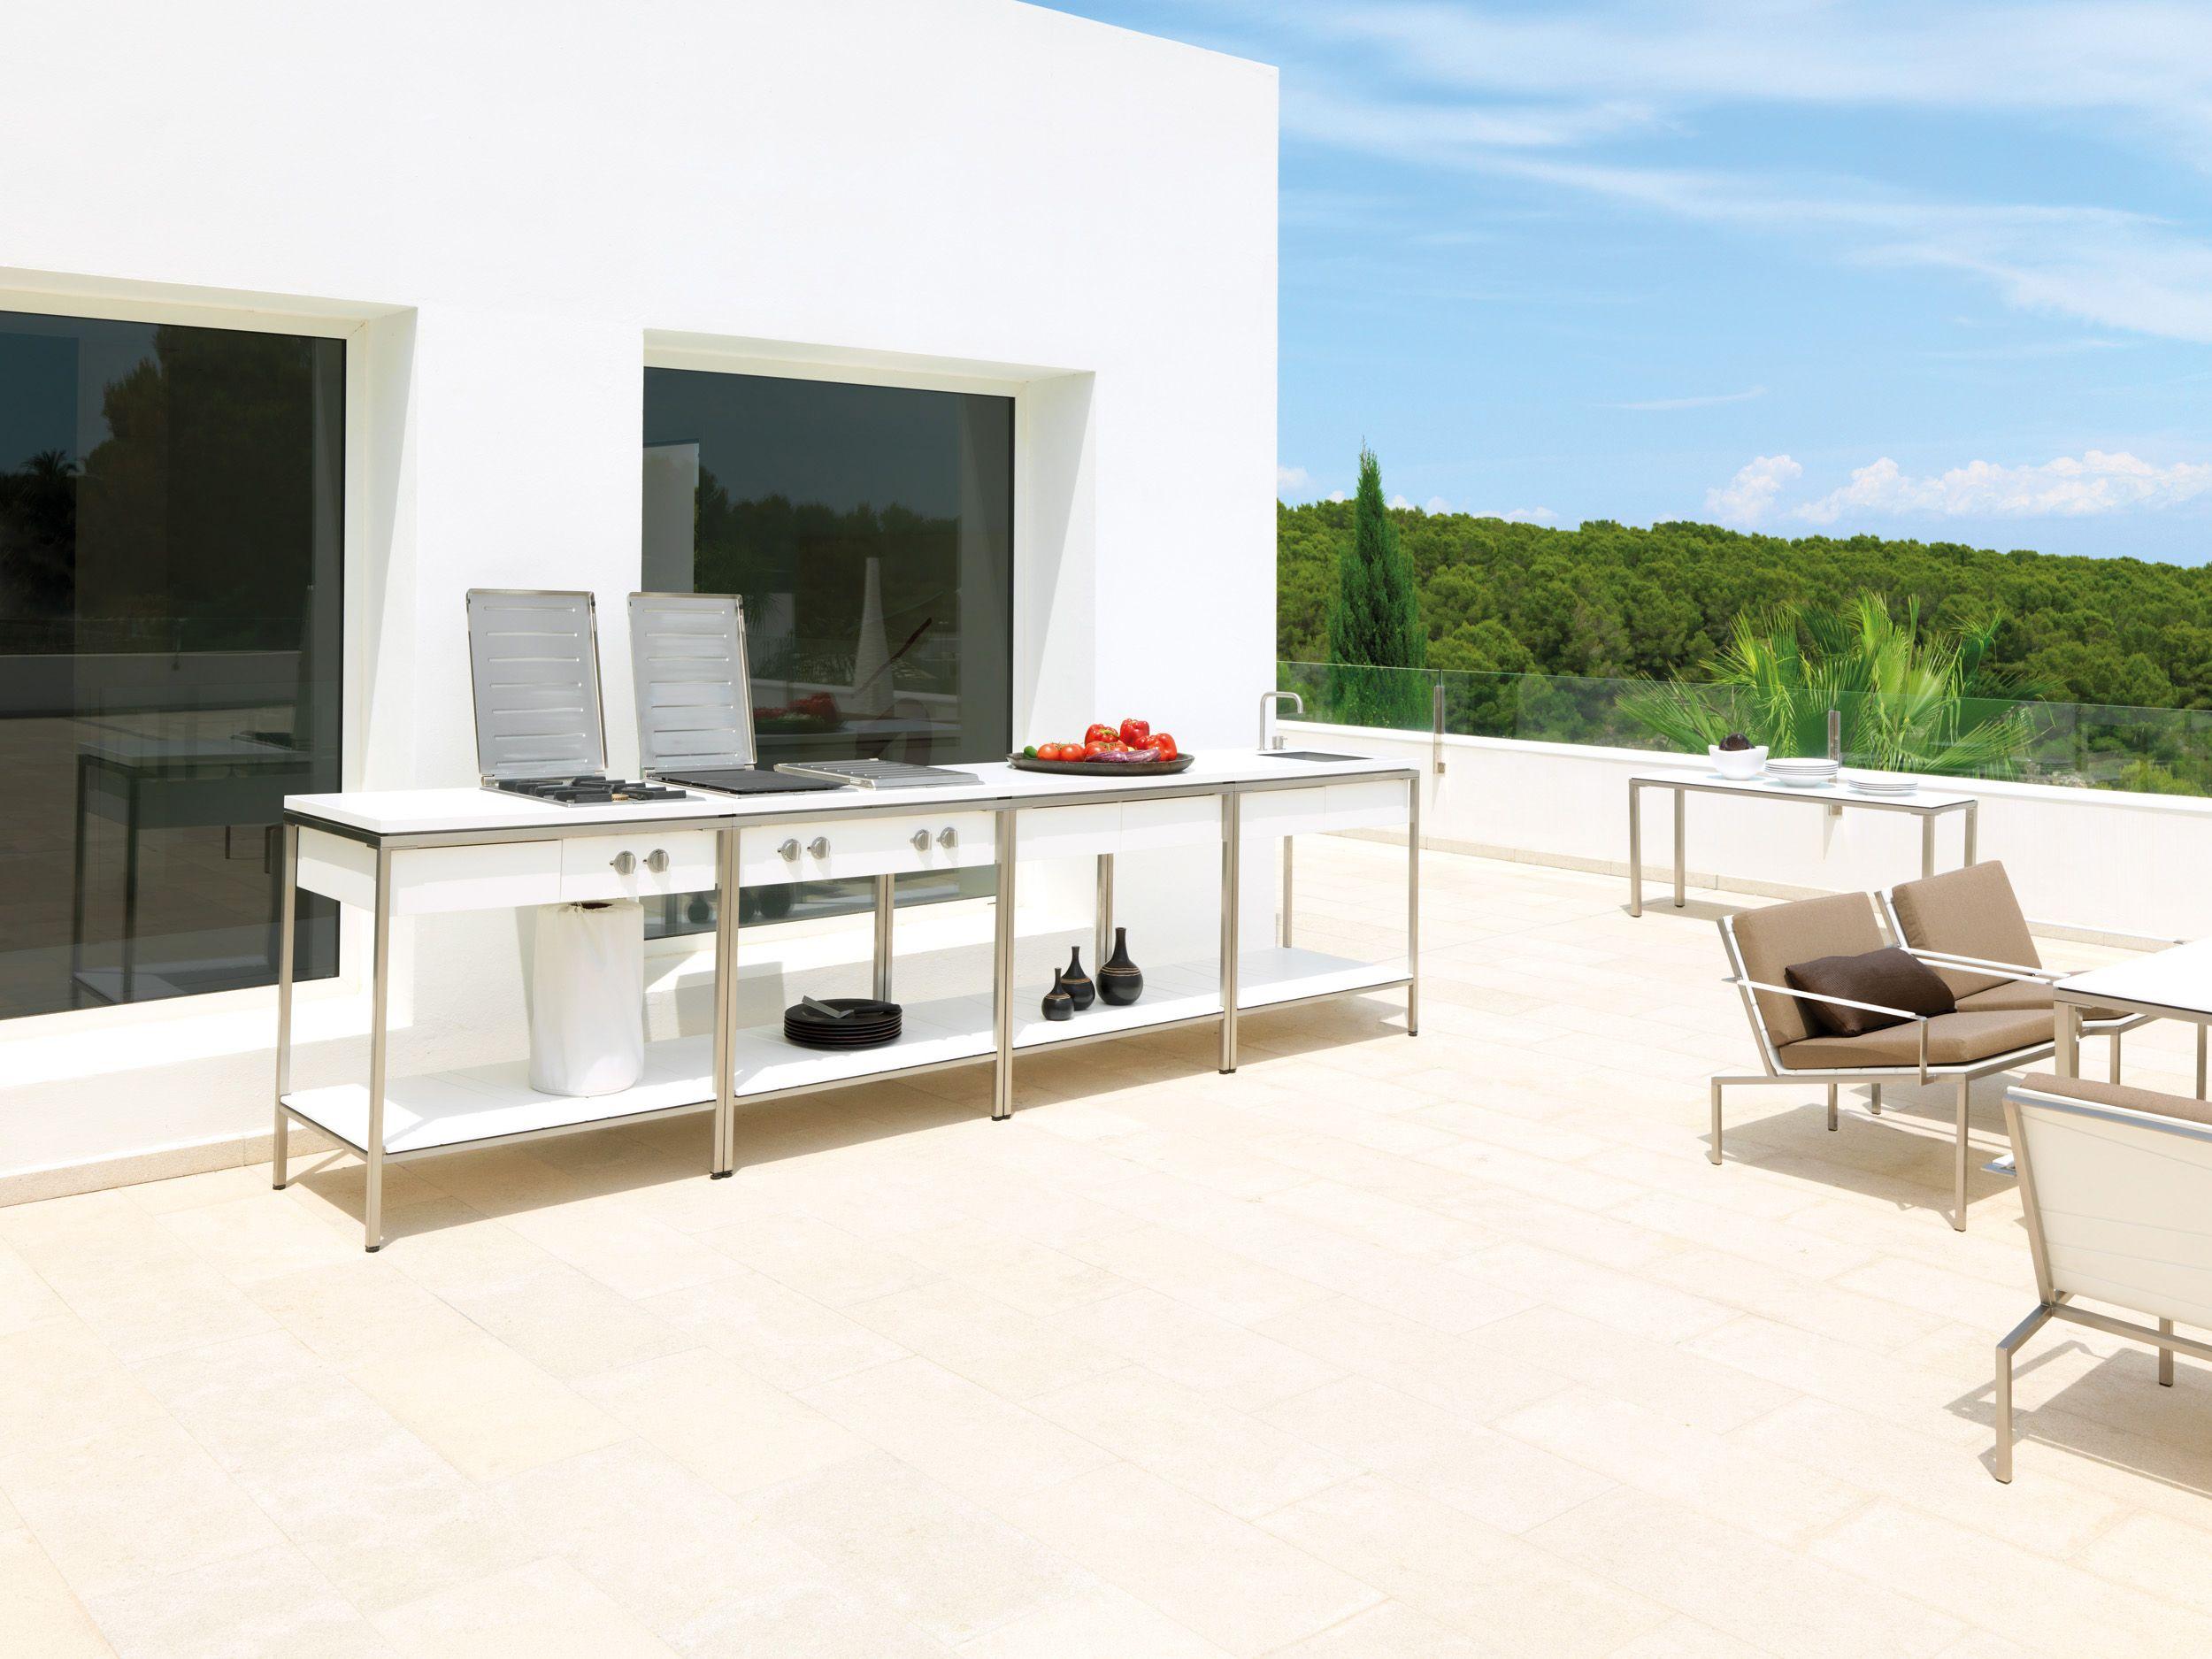 Outdoorküche Gas Ideal : Outdoor küche inox outdoorküche gas ideal studio jakarta